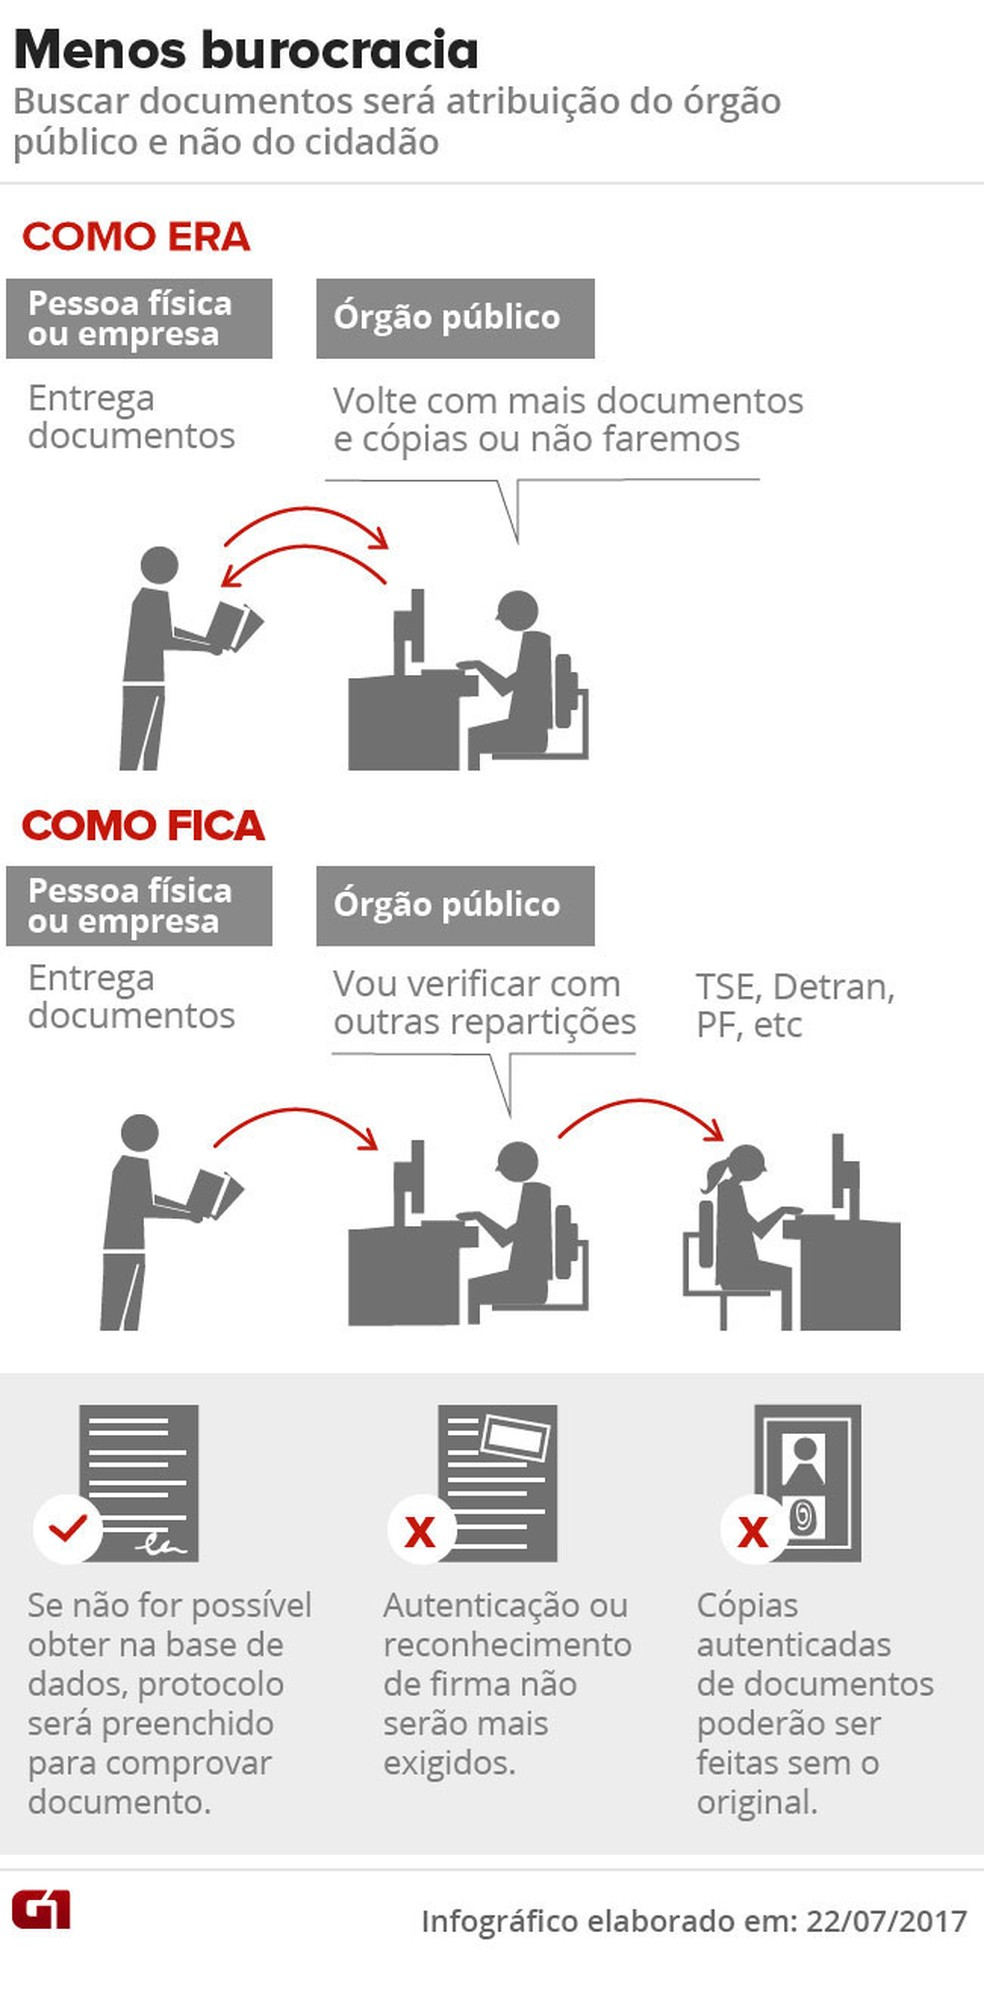 Decreto desburocratiza serviço público (Foto: Editoria de Arte / G1)